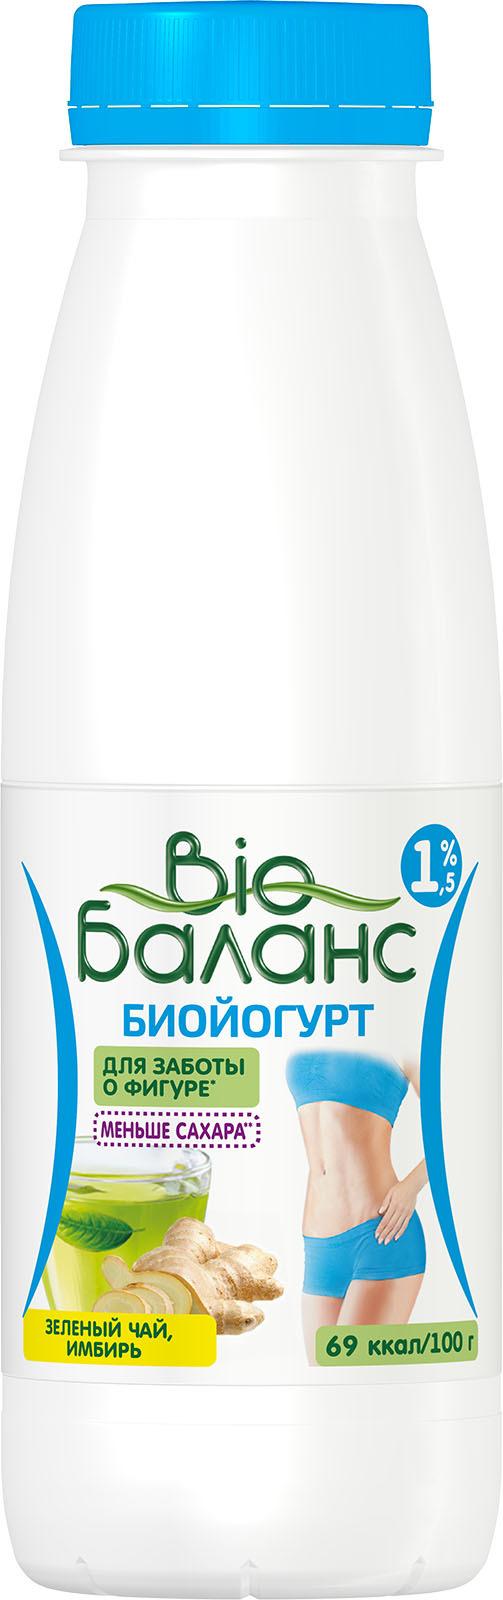 Биойогурт Био-Баланс Зеленый чай, имбирь, 1,5%, 330 г